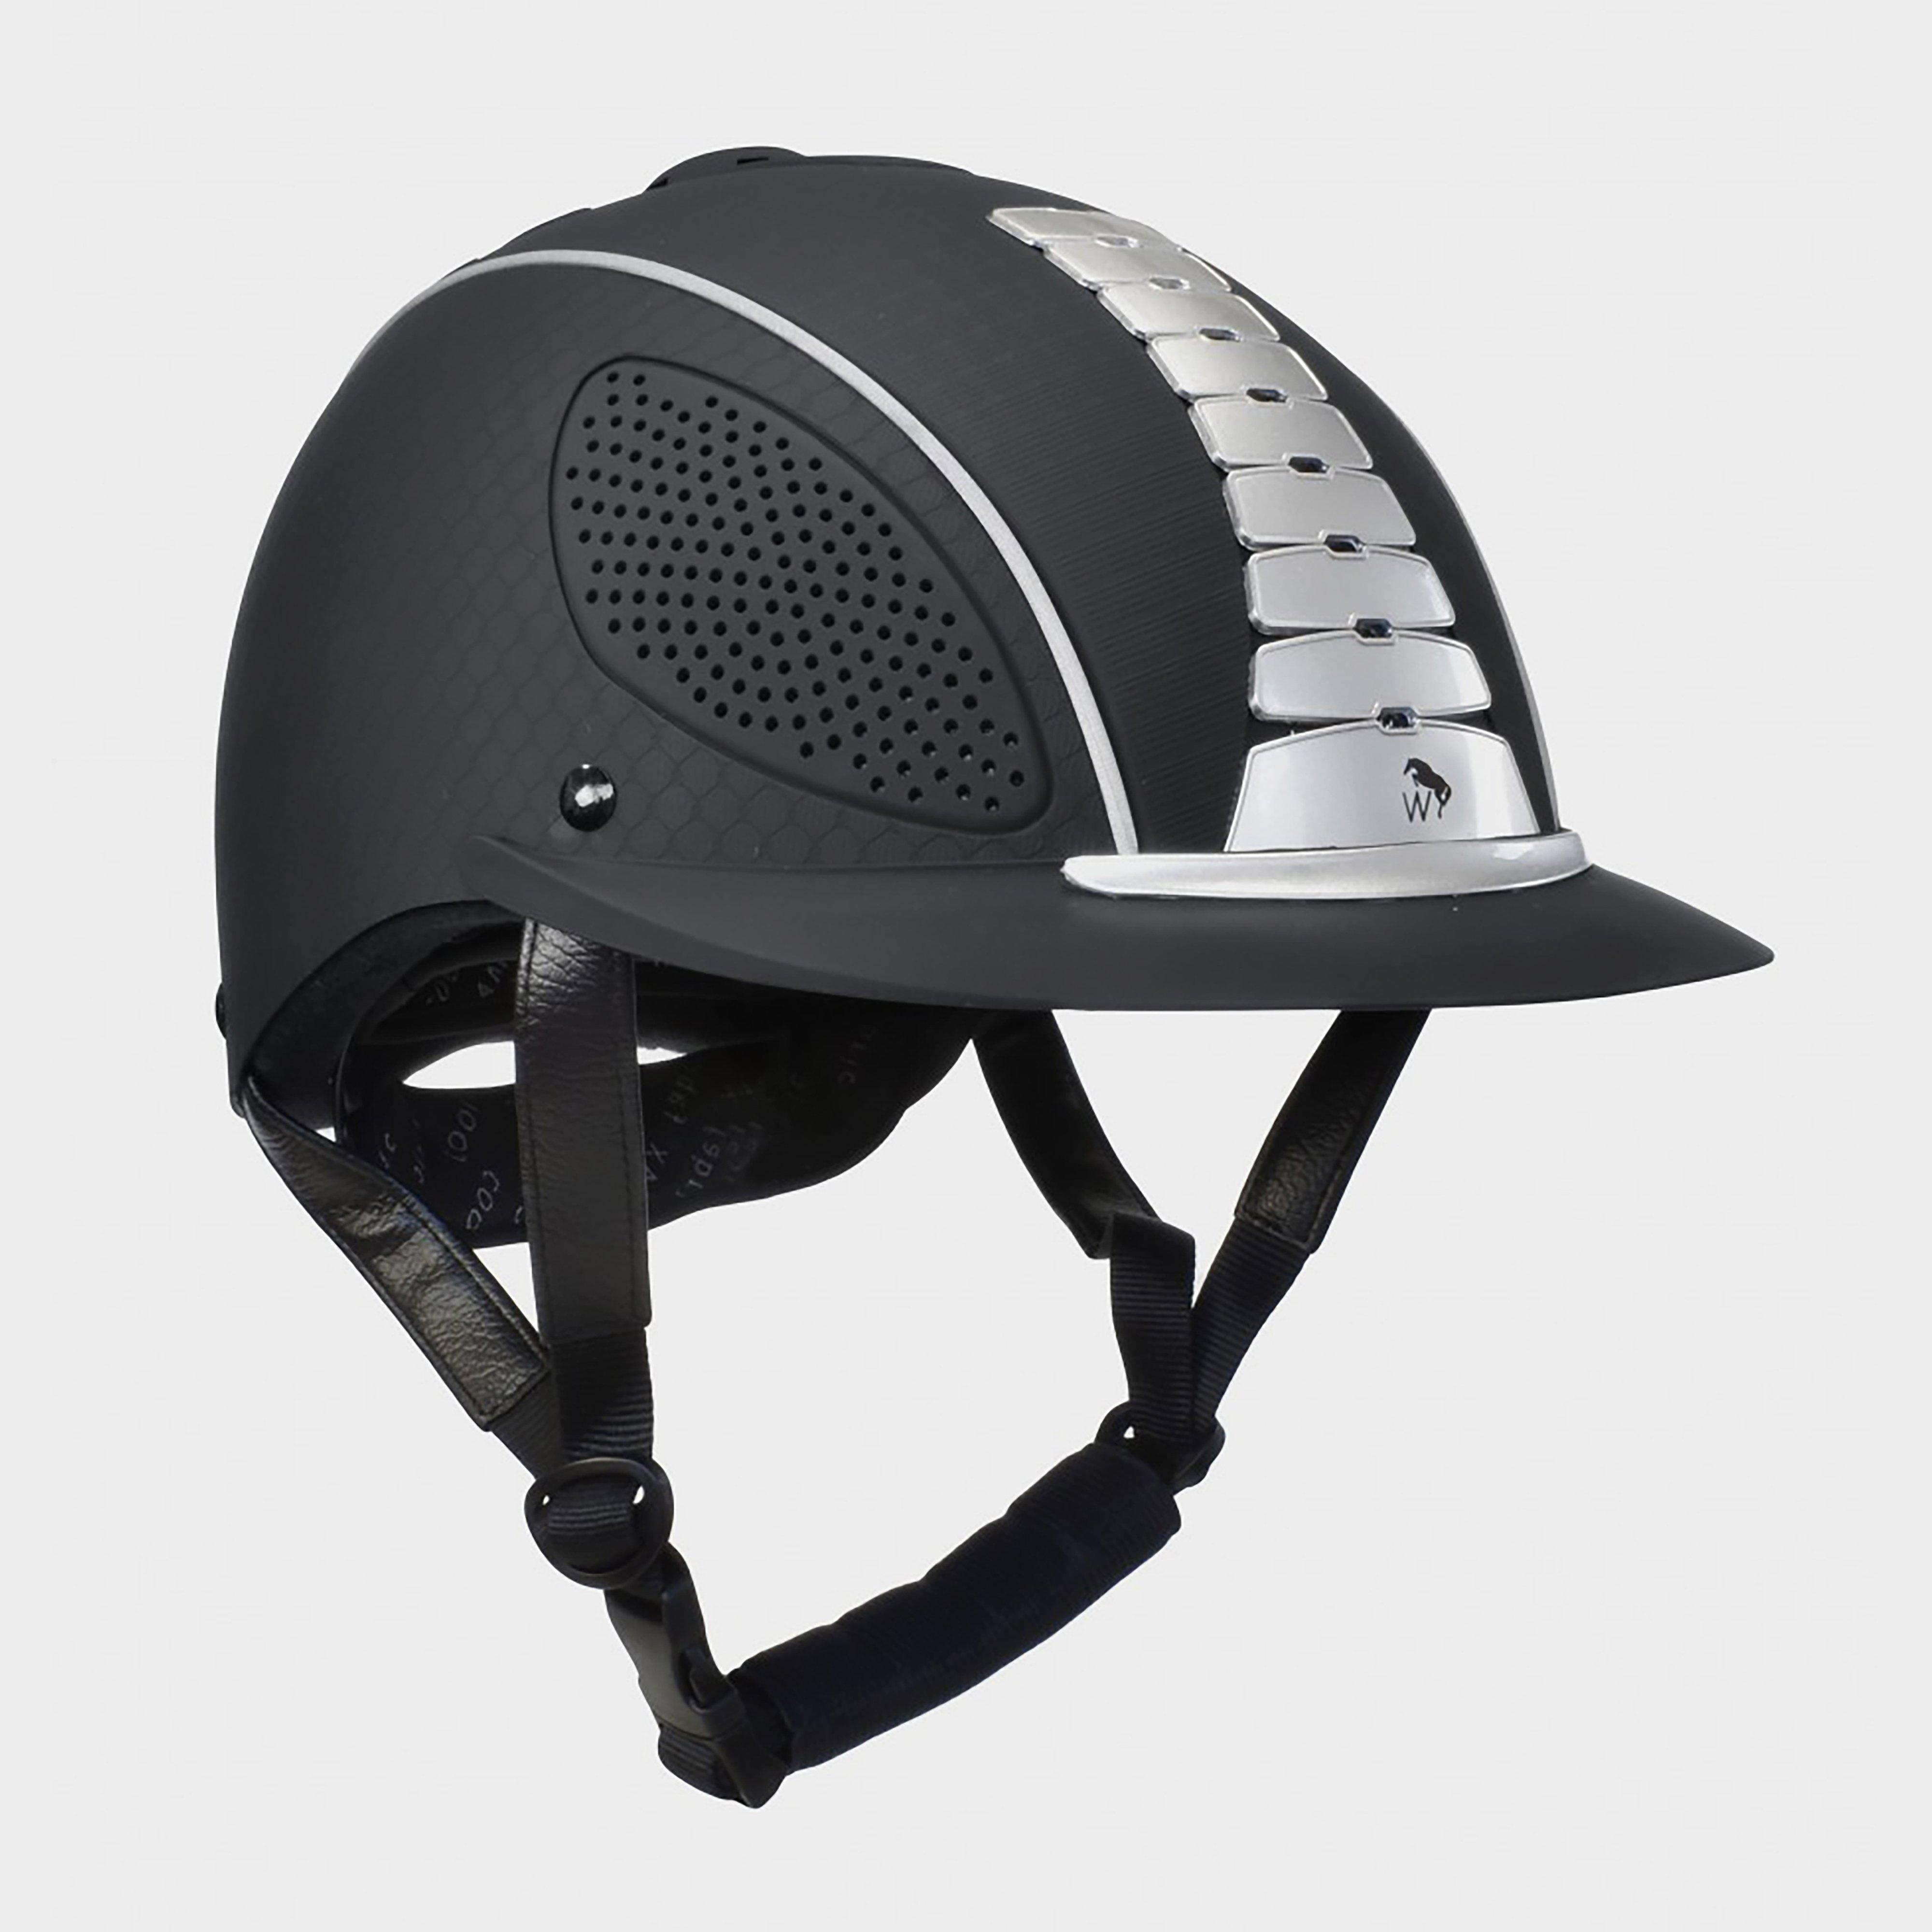 Image of Whitaker Horizon Helmet - Black/Black, BLACK/BLACK